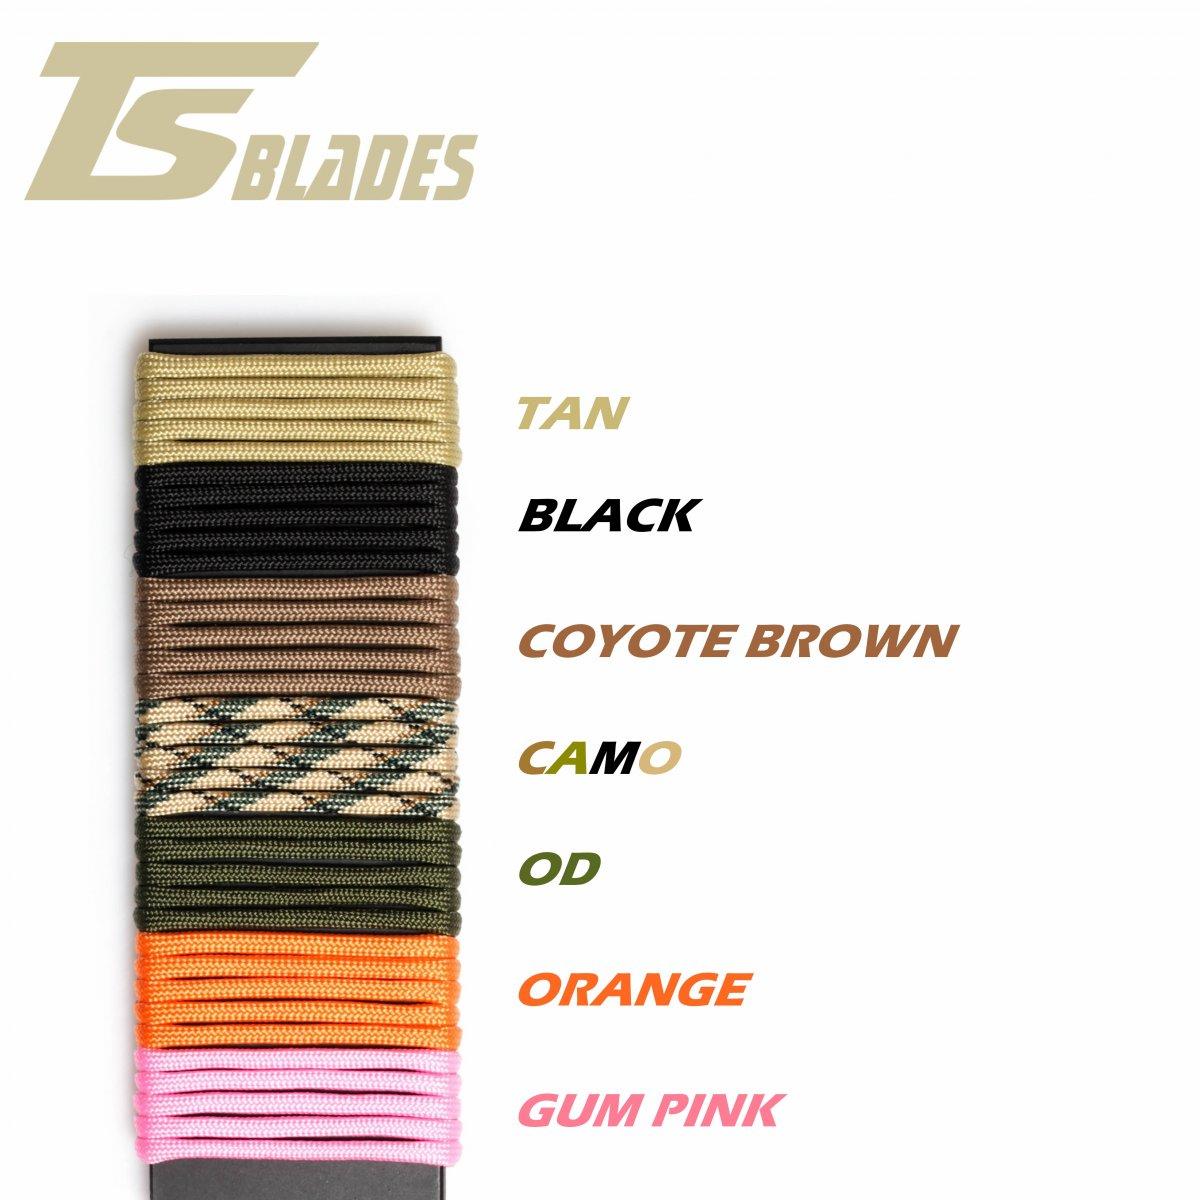 TS Blades Training axe - Black Hawk